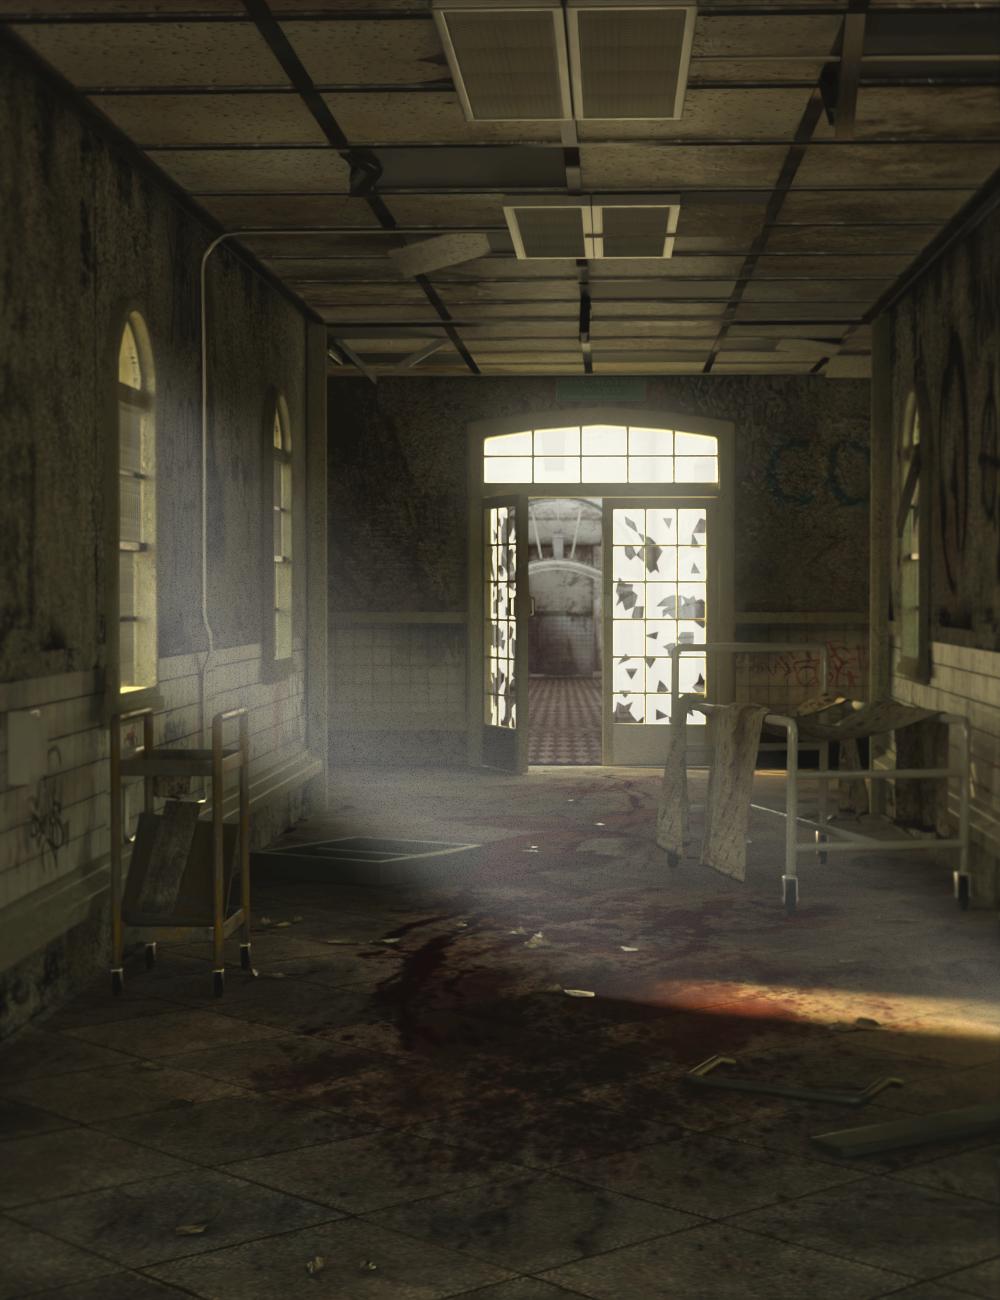 Abandoned Asylum by: PerspectX, 3D Models by Daz 3D